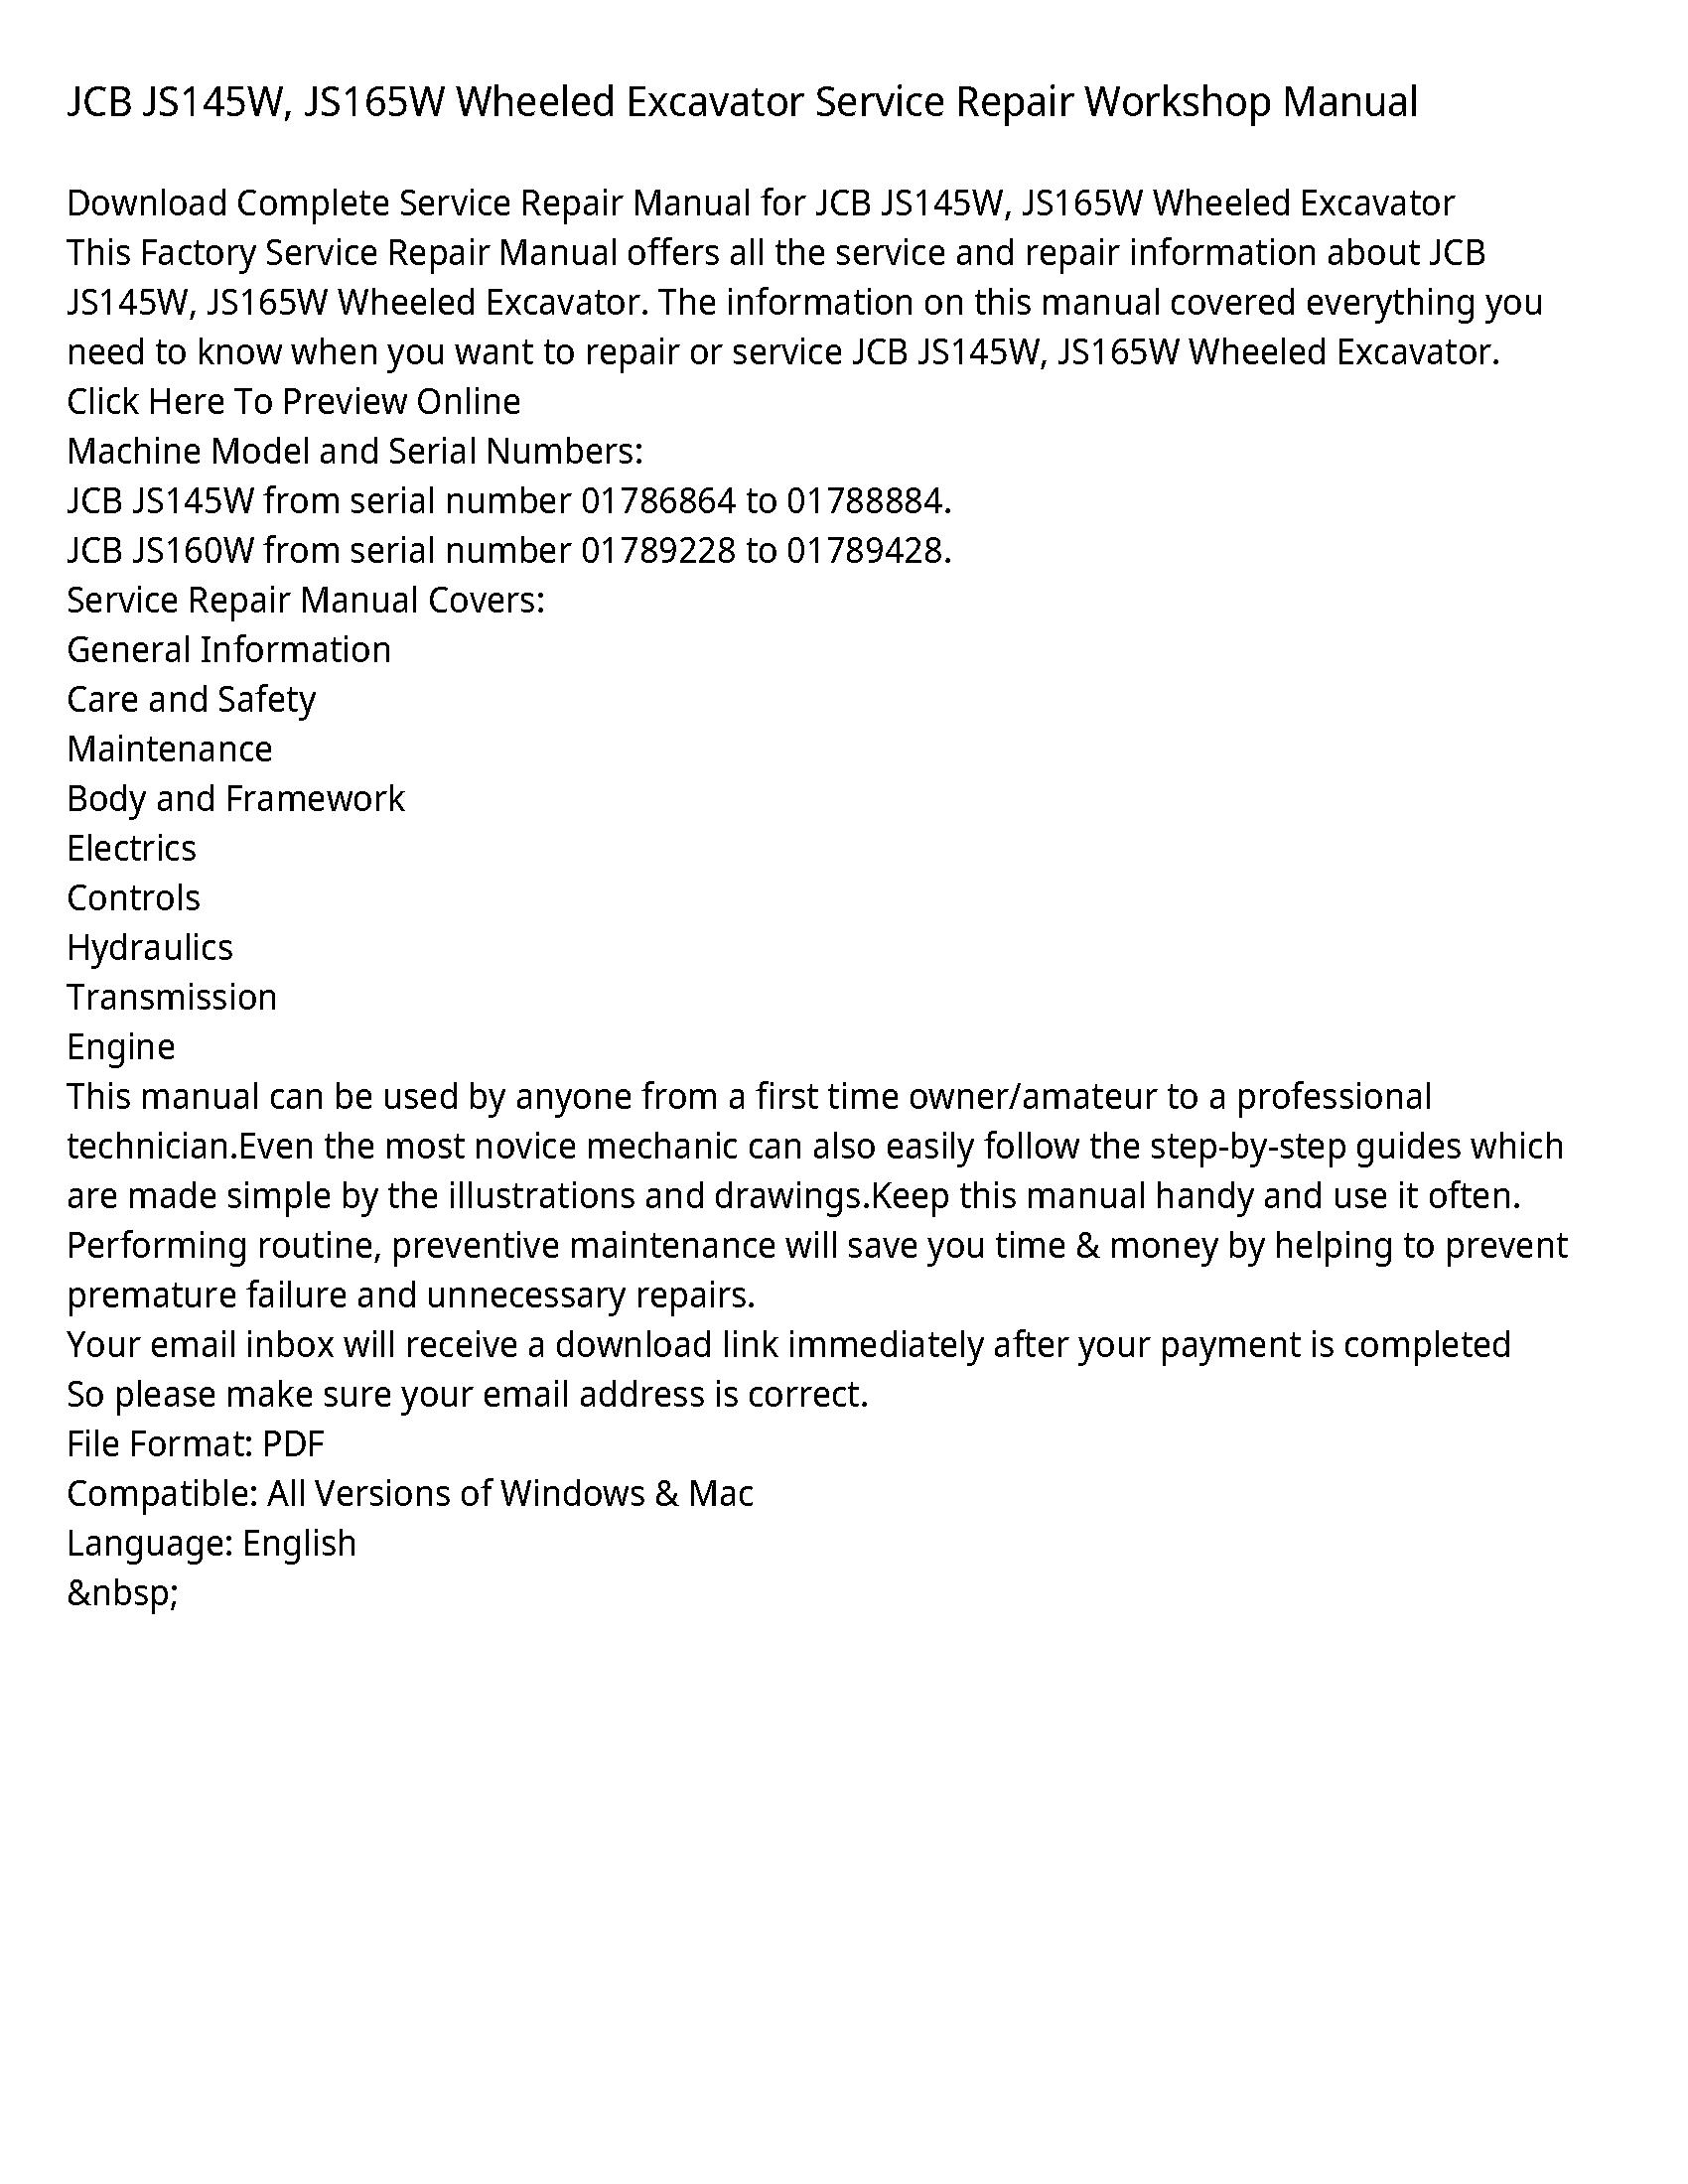 JCB JS165W Wheeled Excavator manual